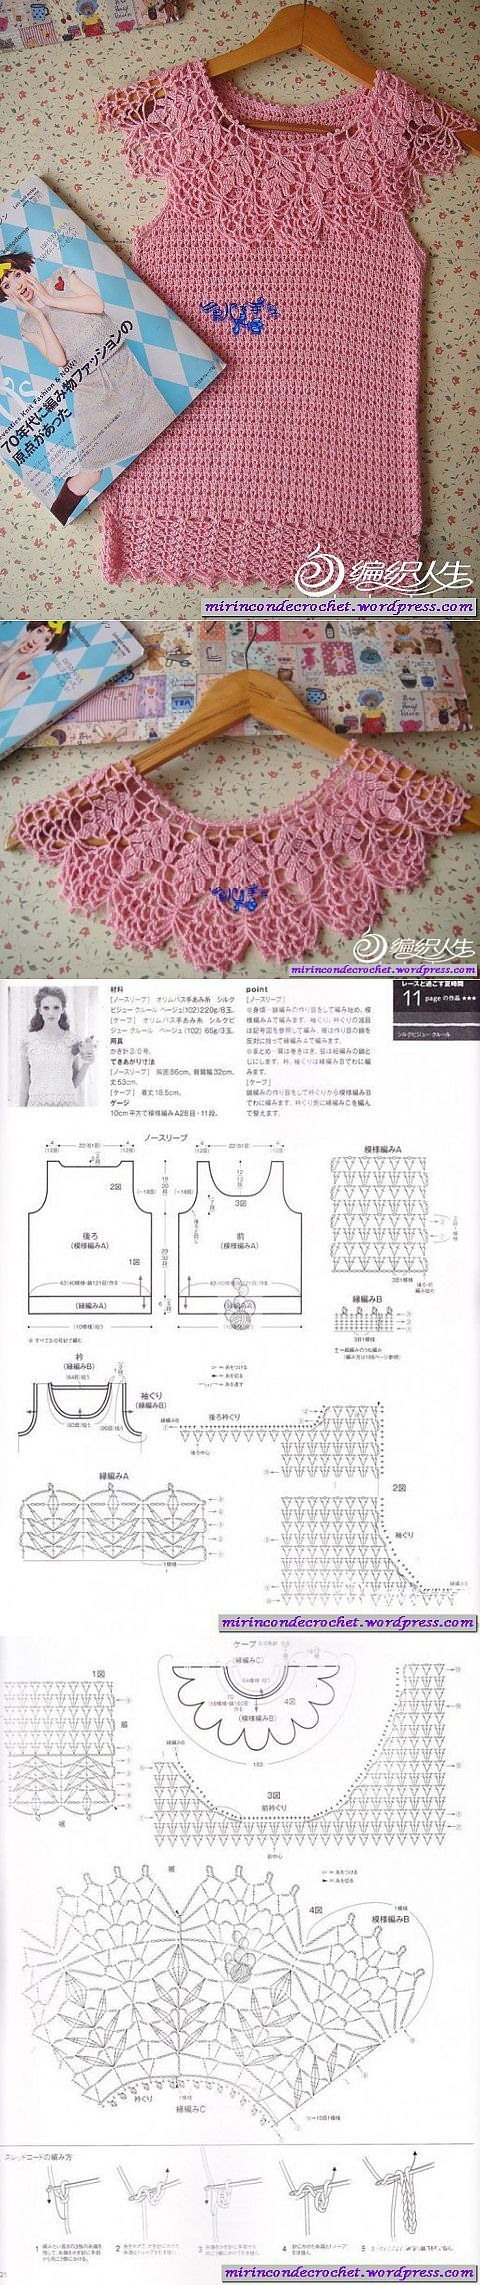 Una remera diferente… | Mi Rincon de Crochet | туники , кофточки | Постила